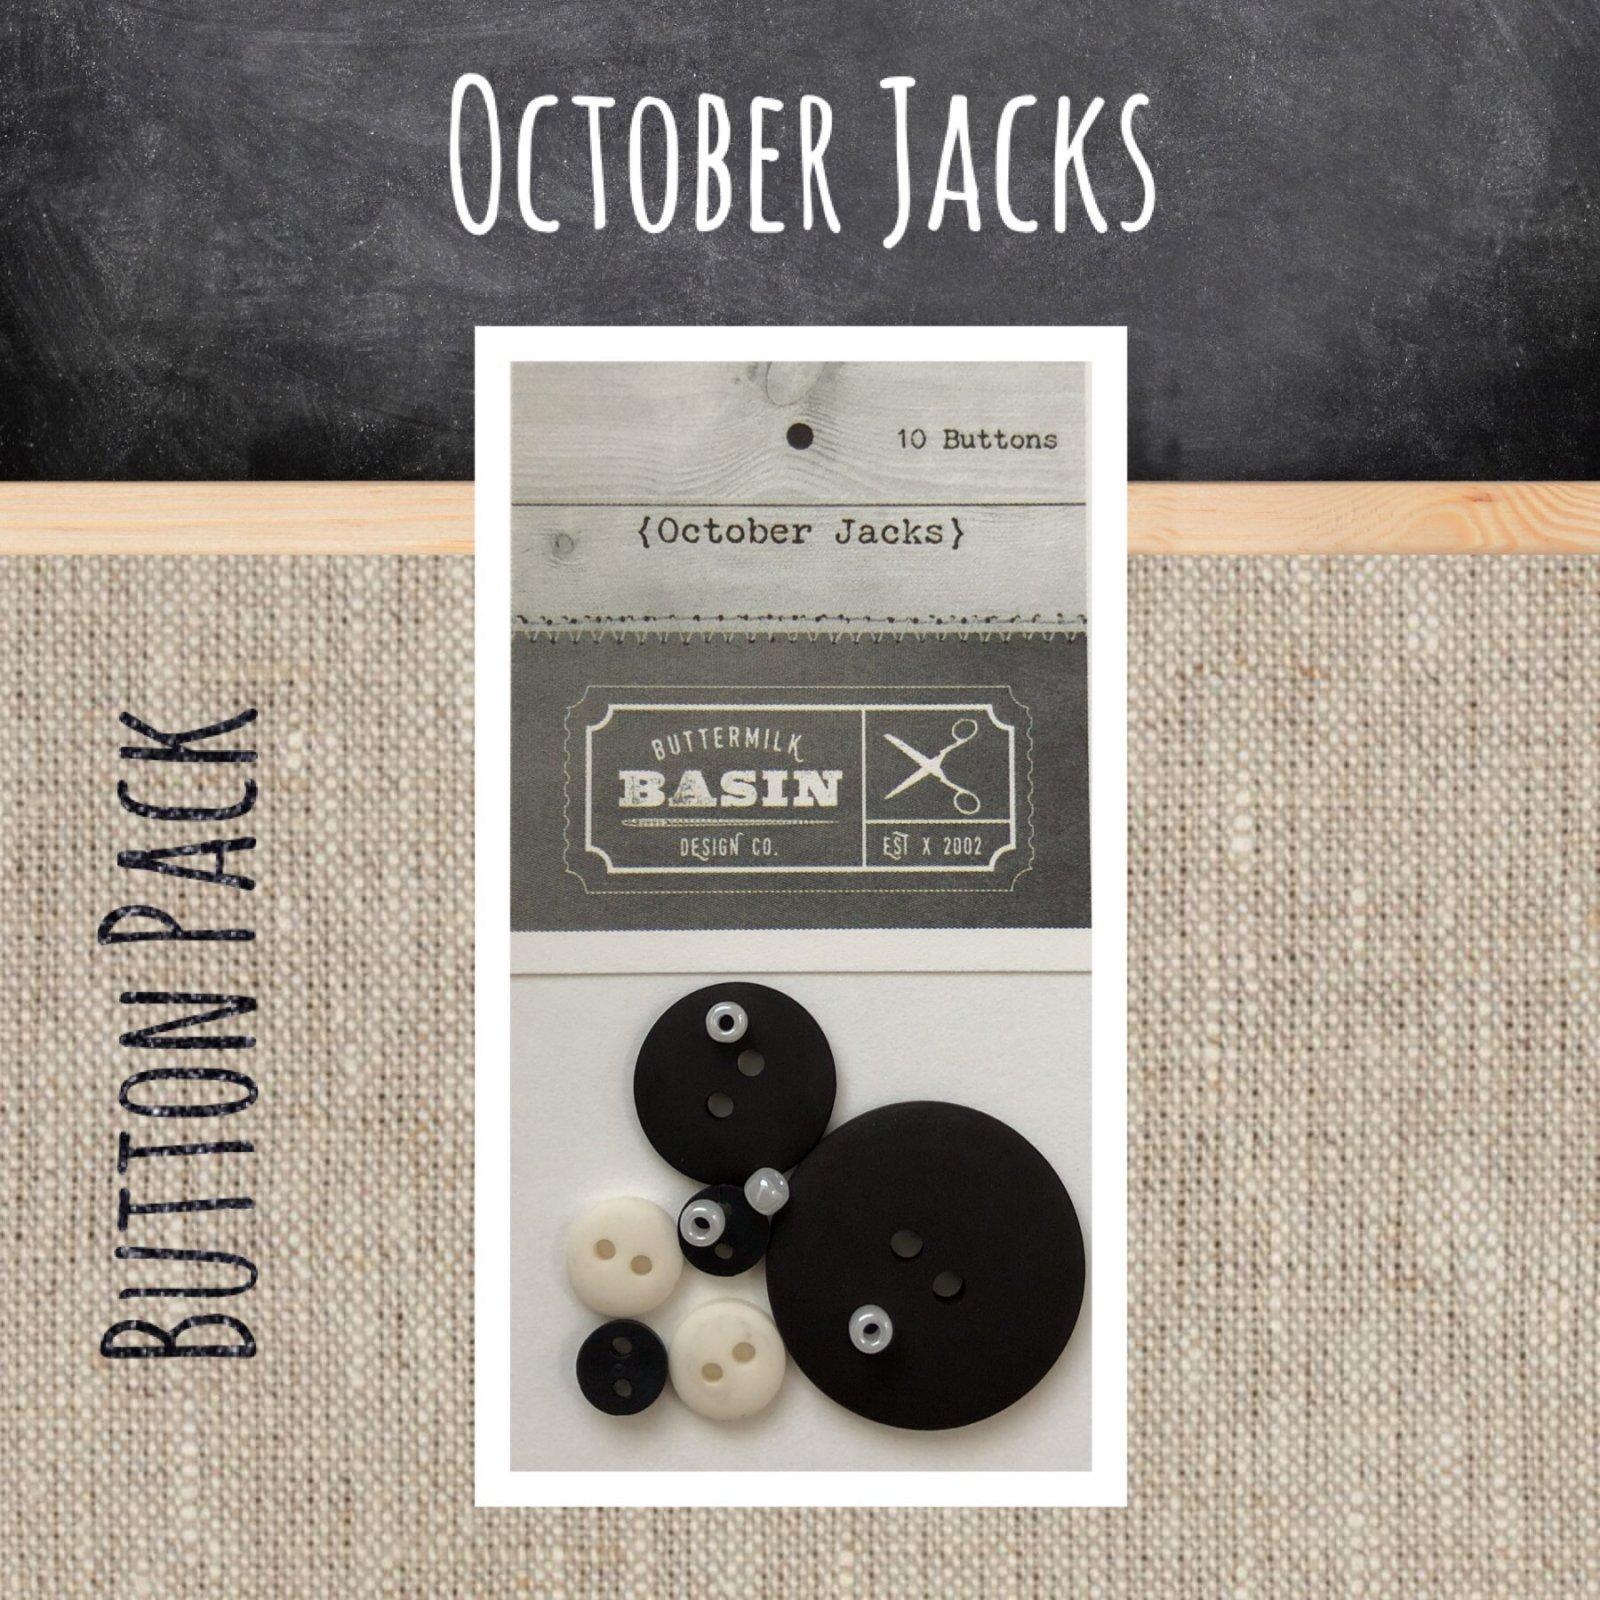 October Jacks BUTTON Pack